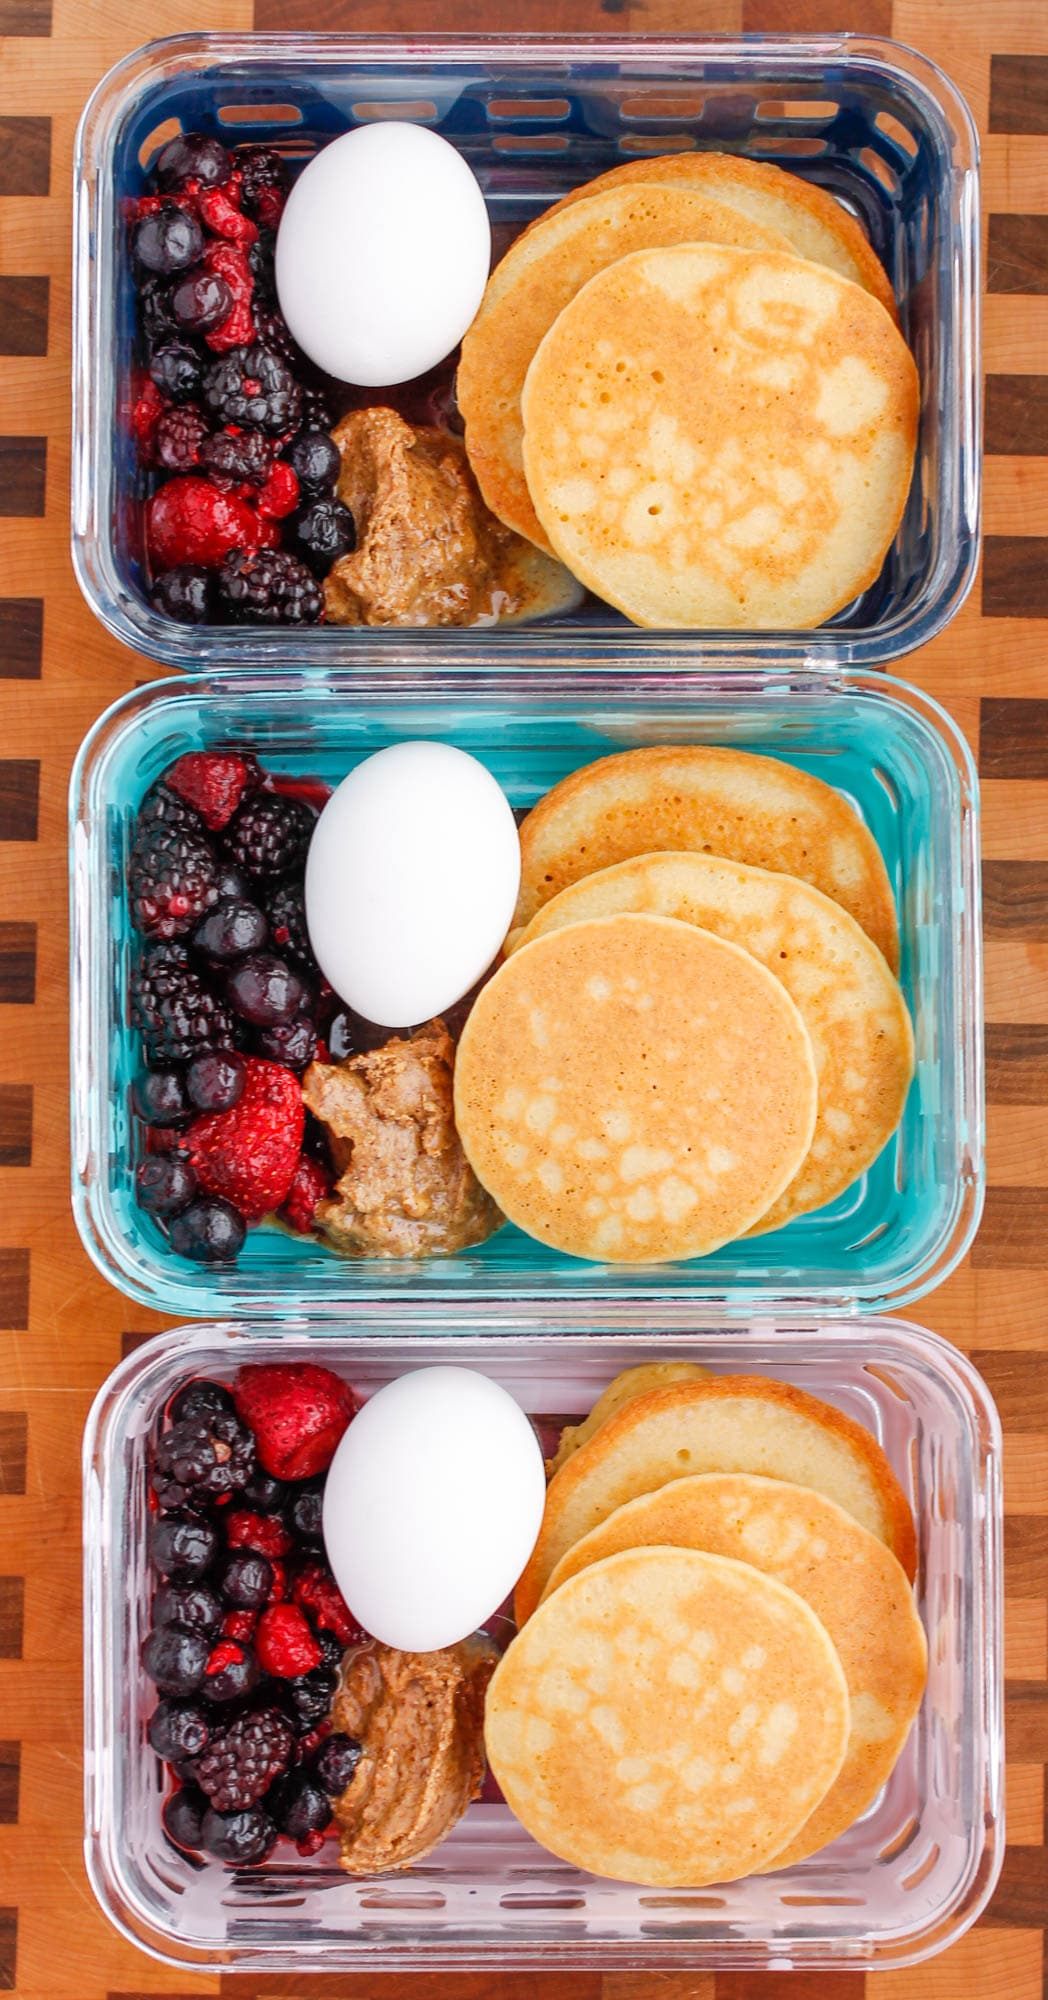 Paleo Pancake Breakfast Meal Prep Bowls - Smile Sandwich